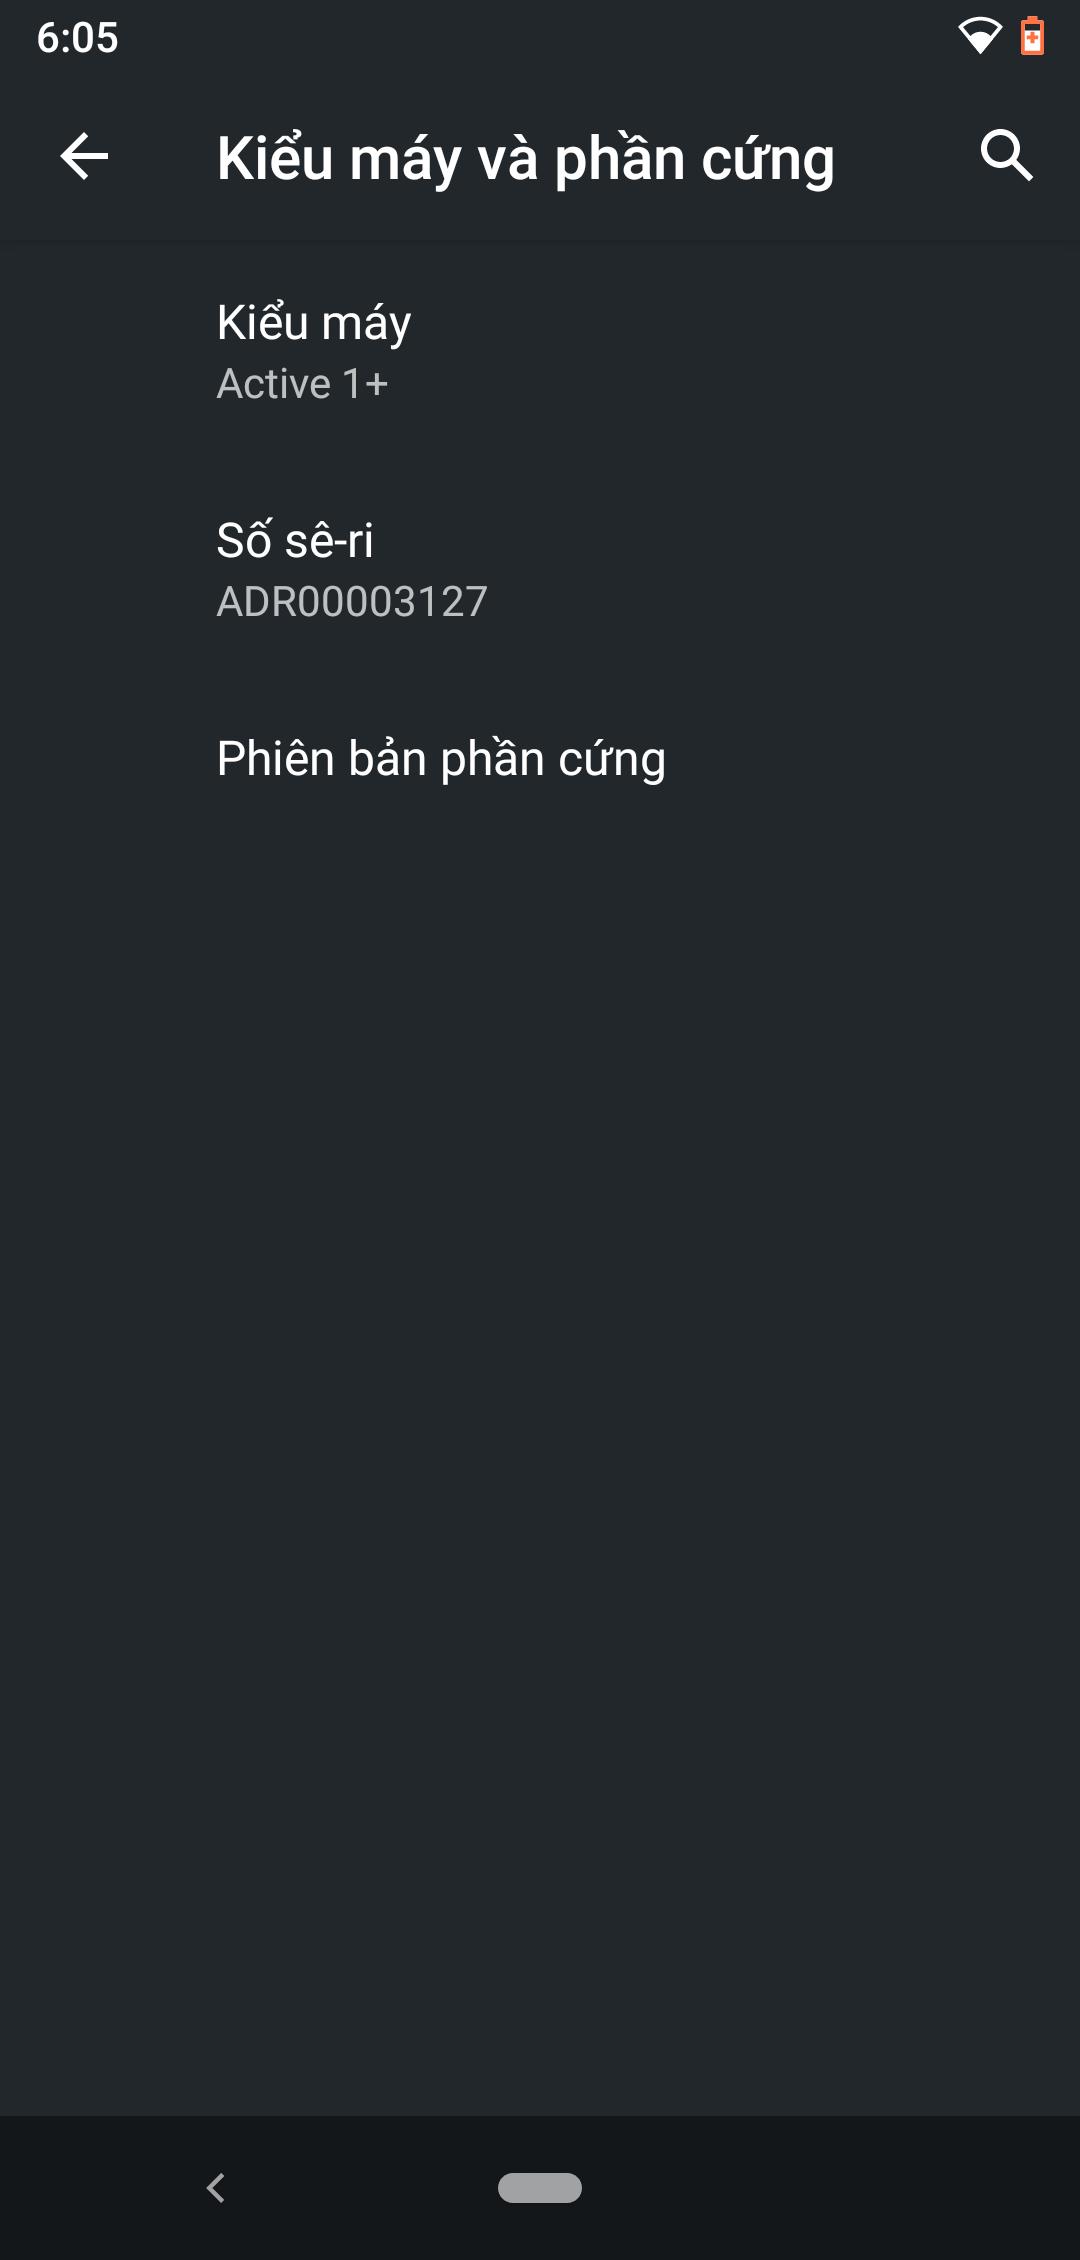 Screenshot_20210504-060525.png